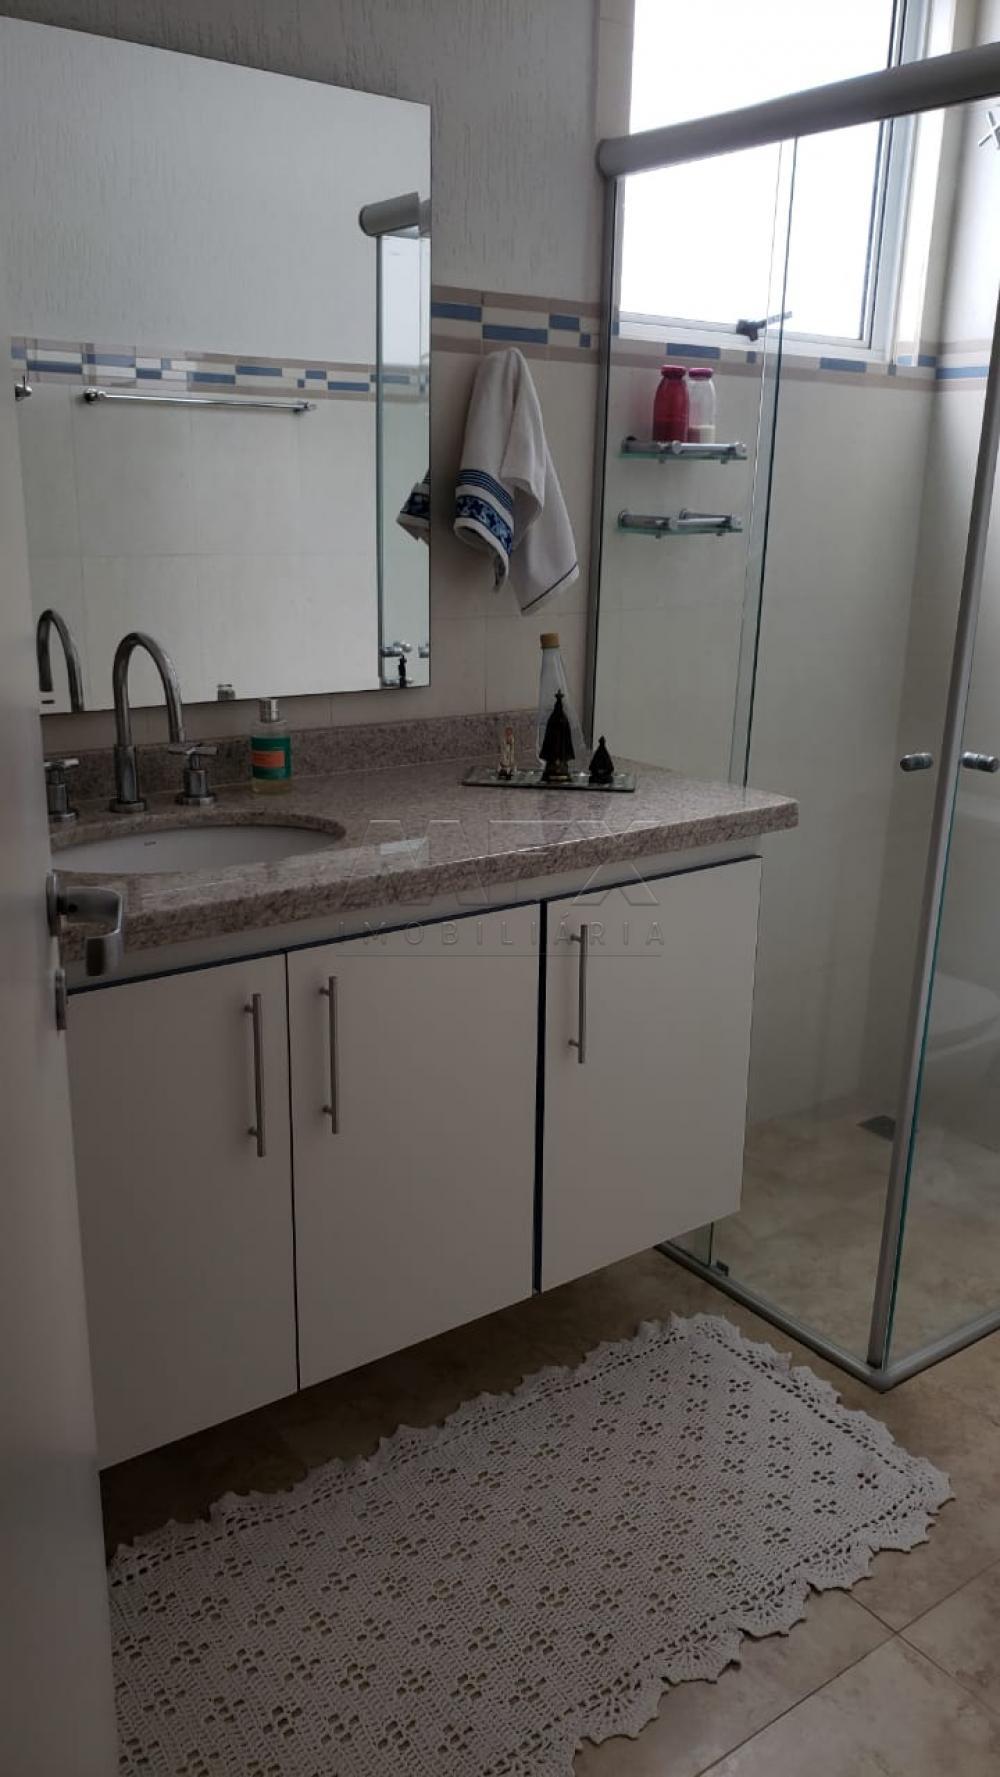 Comprar Casa / Condomínio em Bauru apenas R$ 990.000,00 - Foto 12